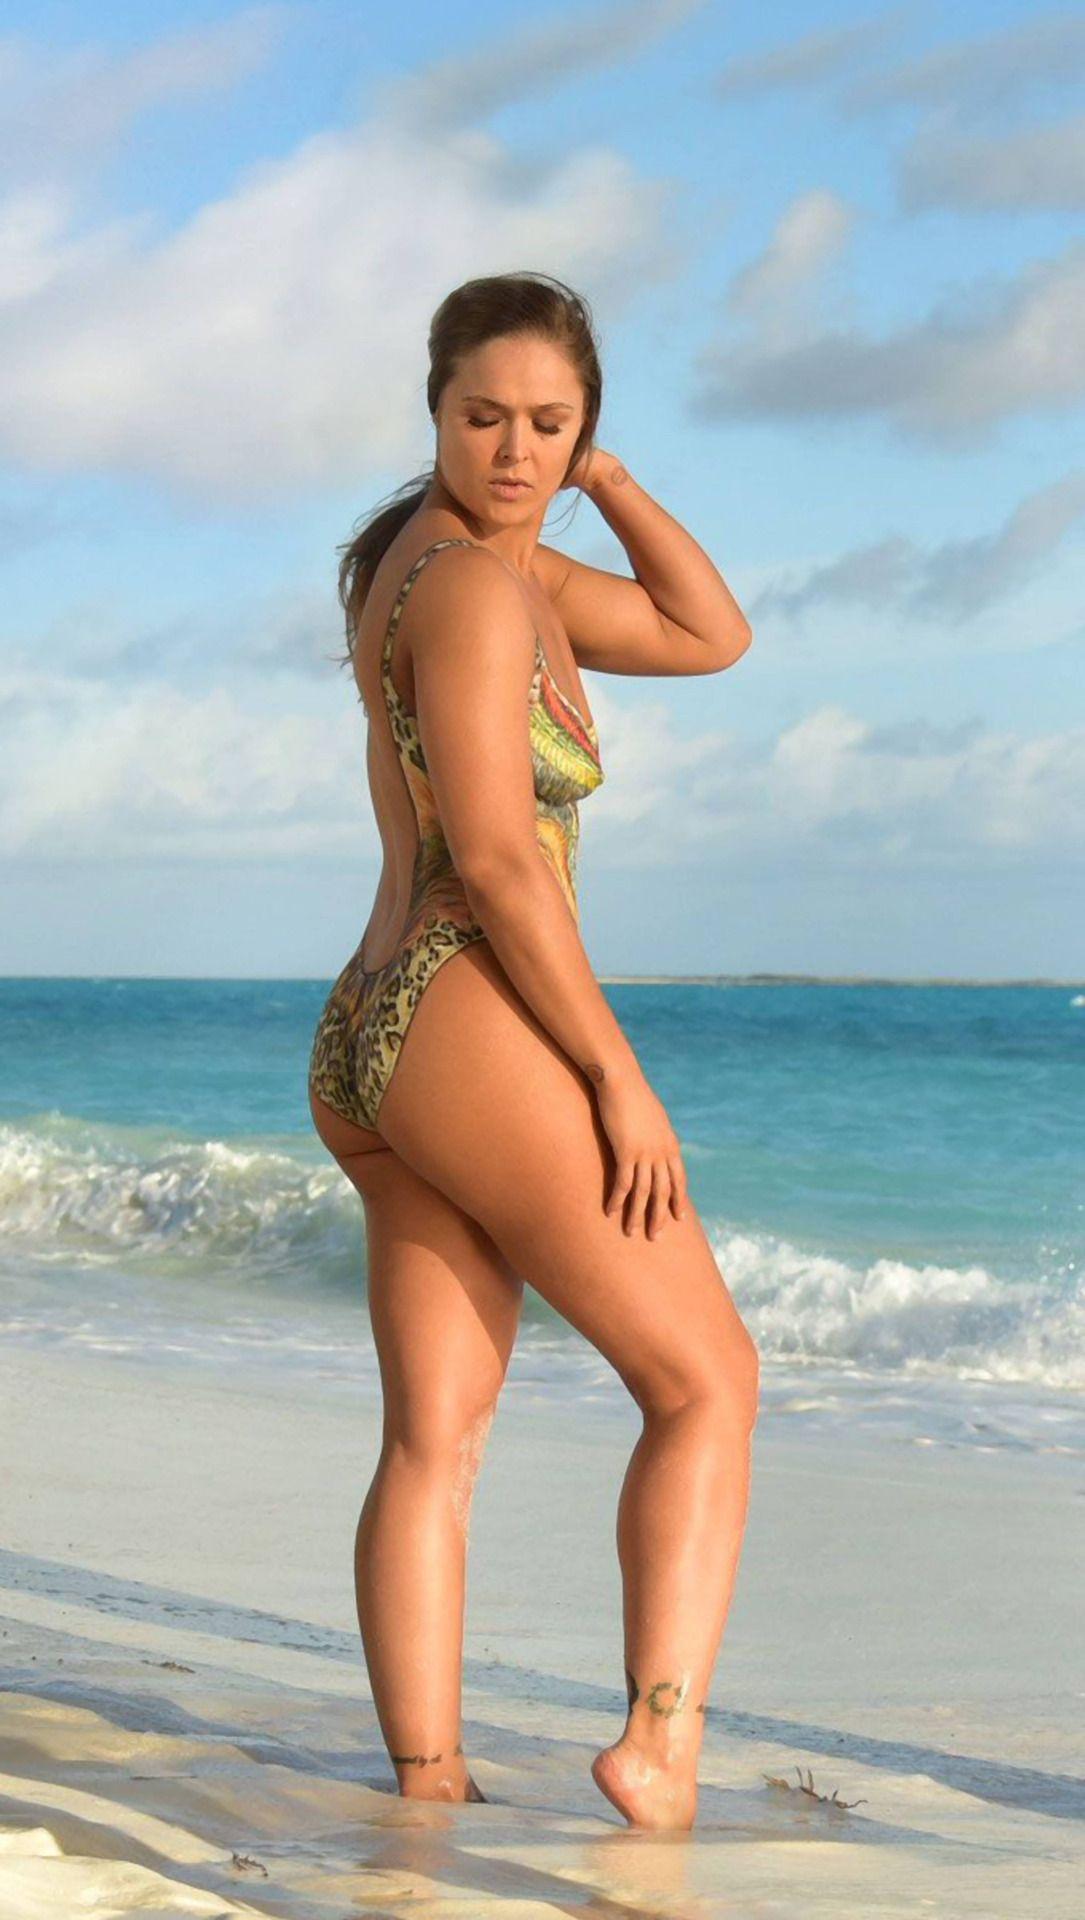 Ronda Rousey Bodypaint Ronda Rousey Ronda Rousey Ronda